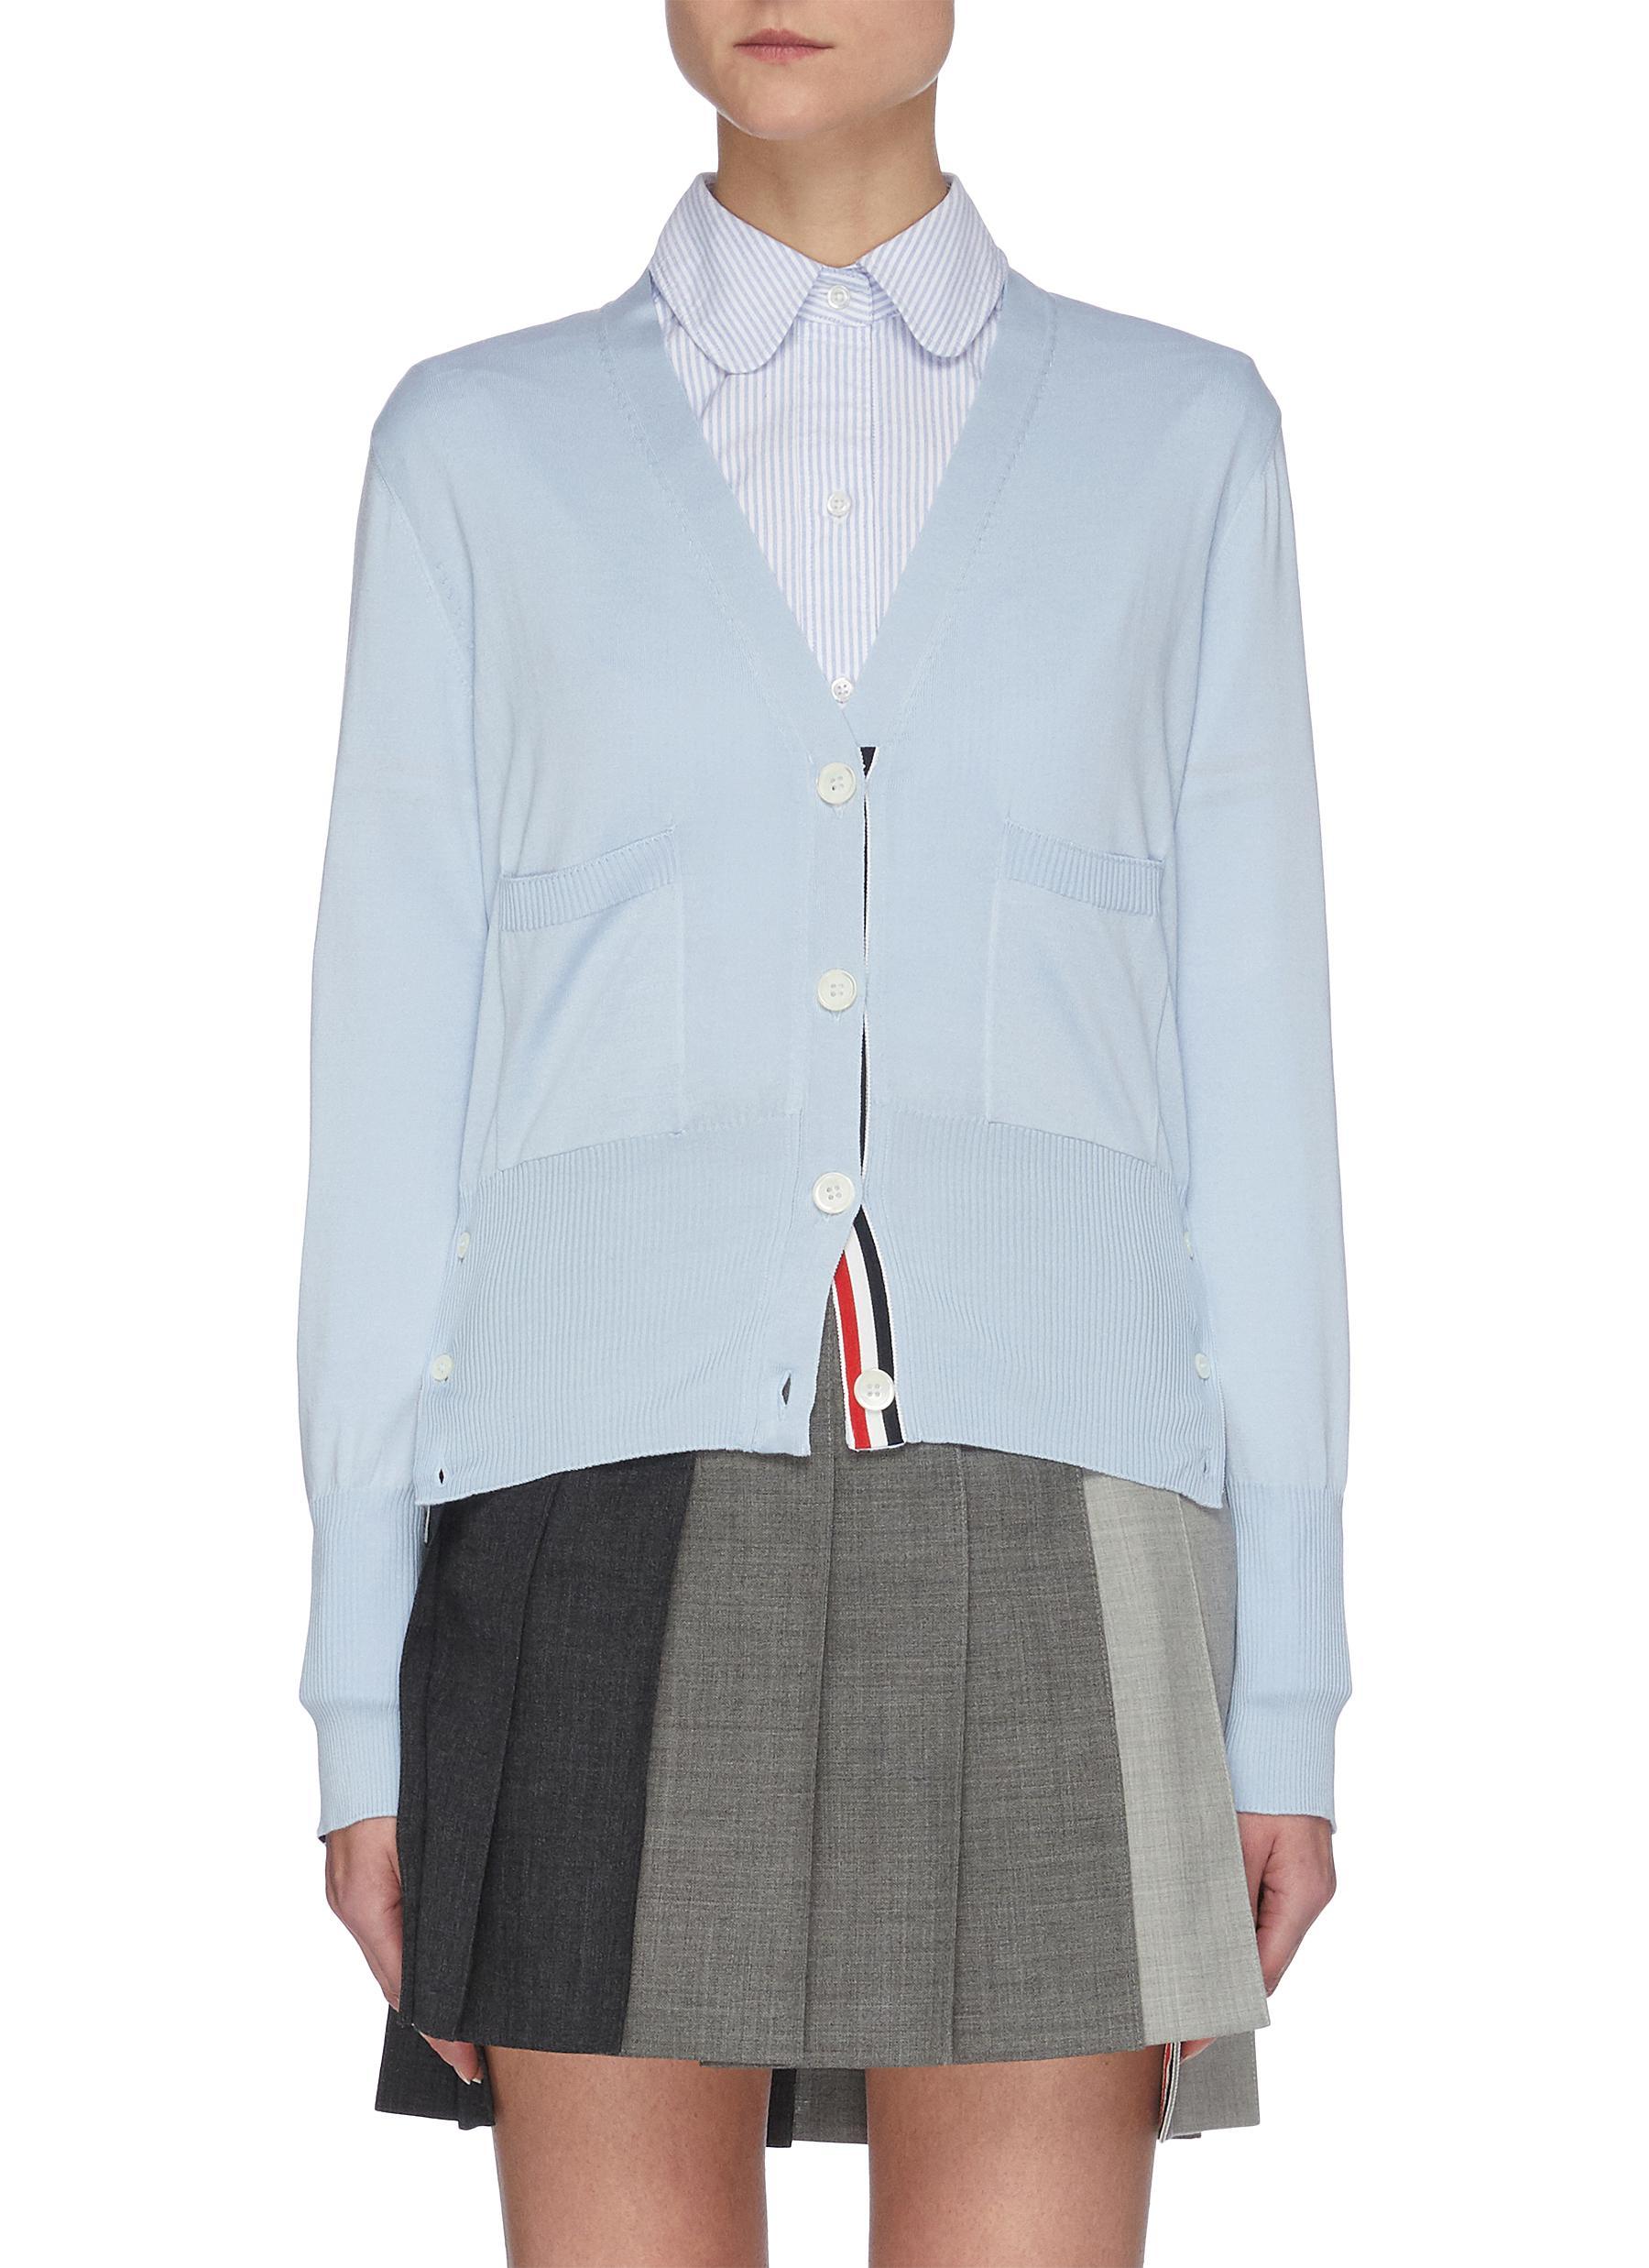 Intarsia stripe back cardigan - THOM BROWNE - Modalova